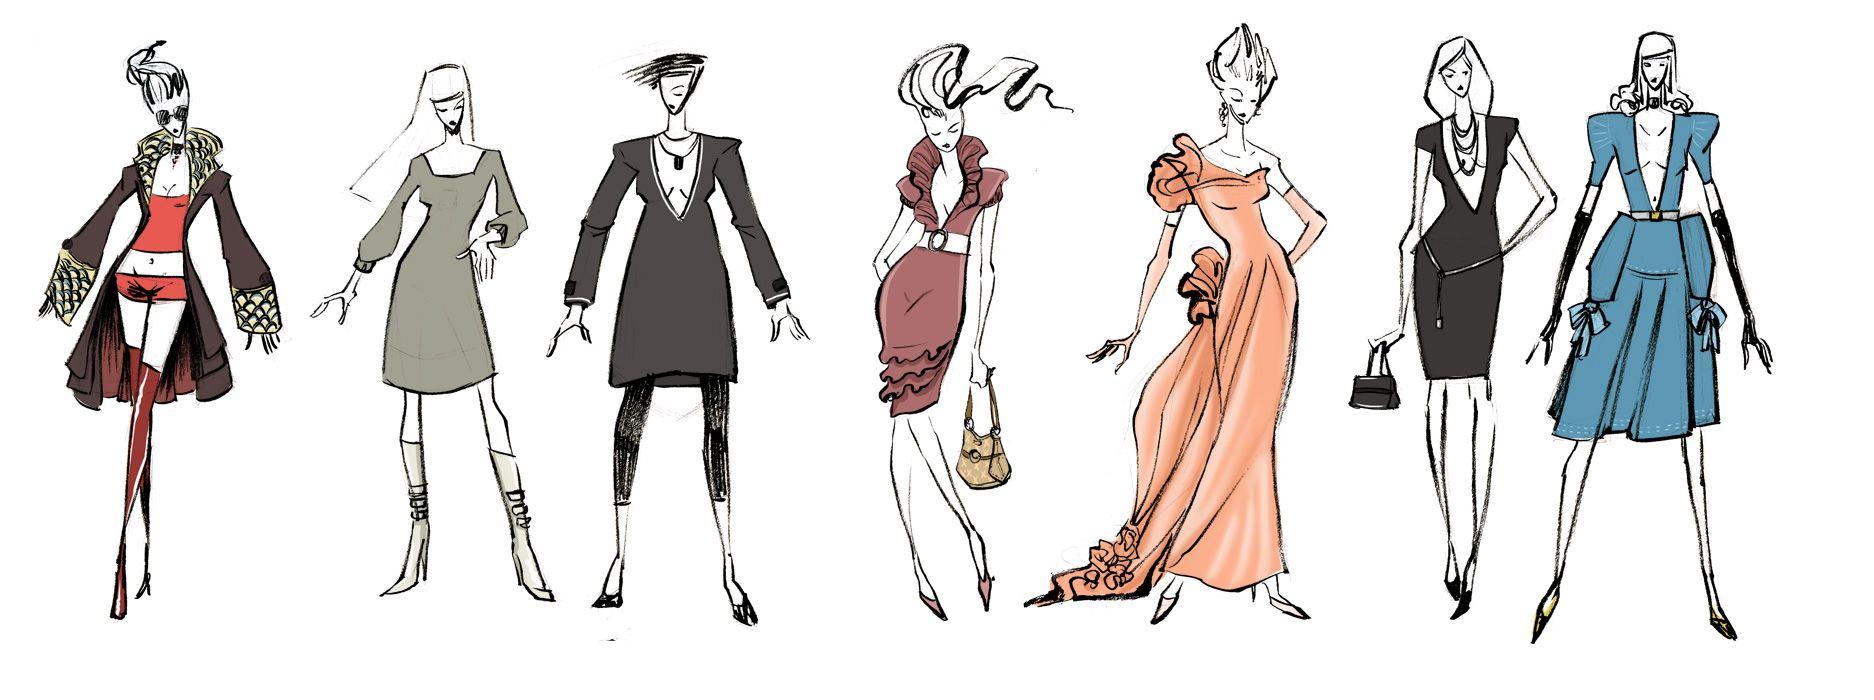 fashion design ideas 10 images about fashion illustration on pinterest top fashion - Fashion Design Ideas